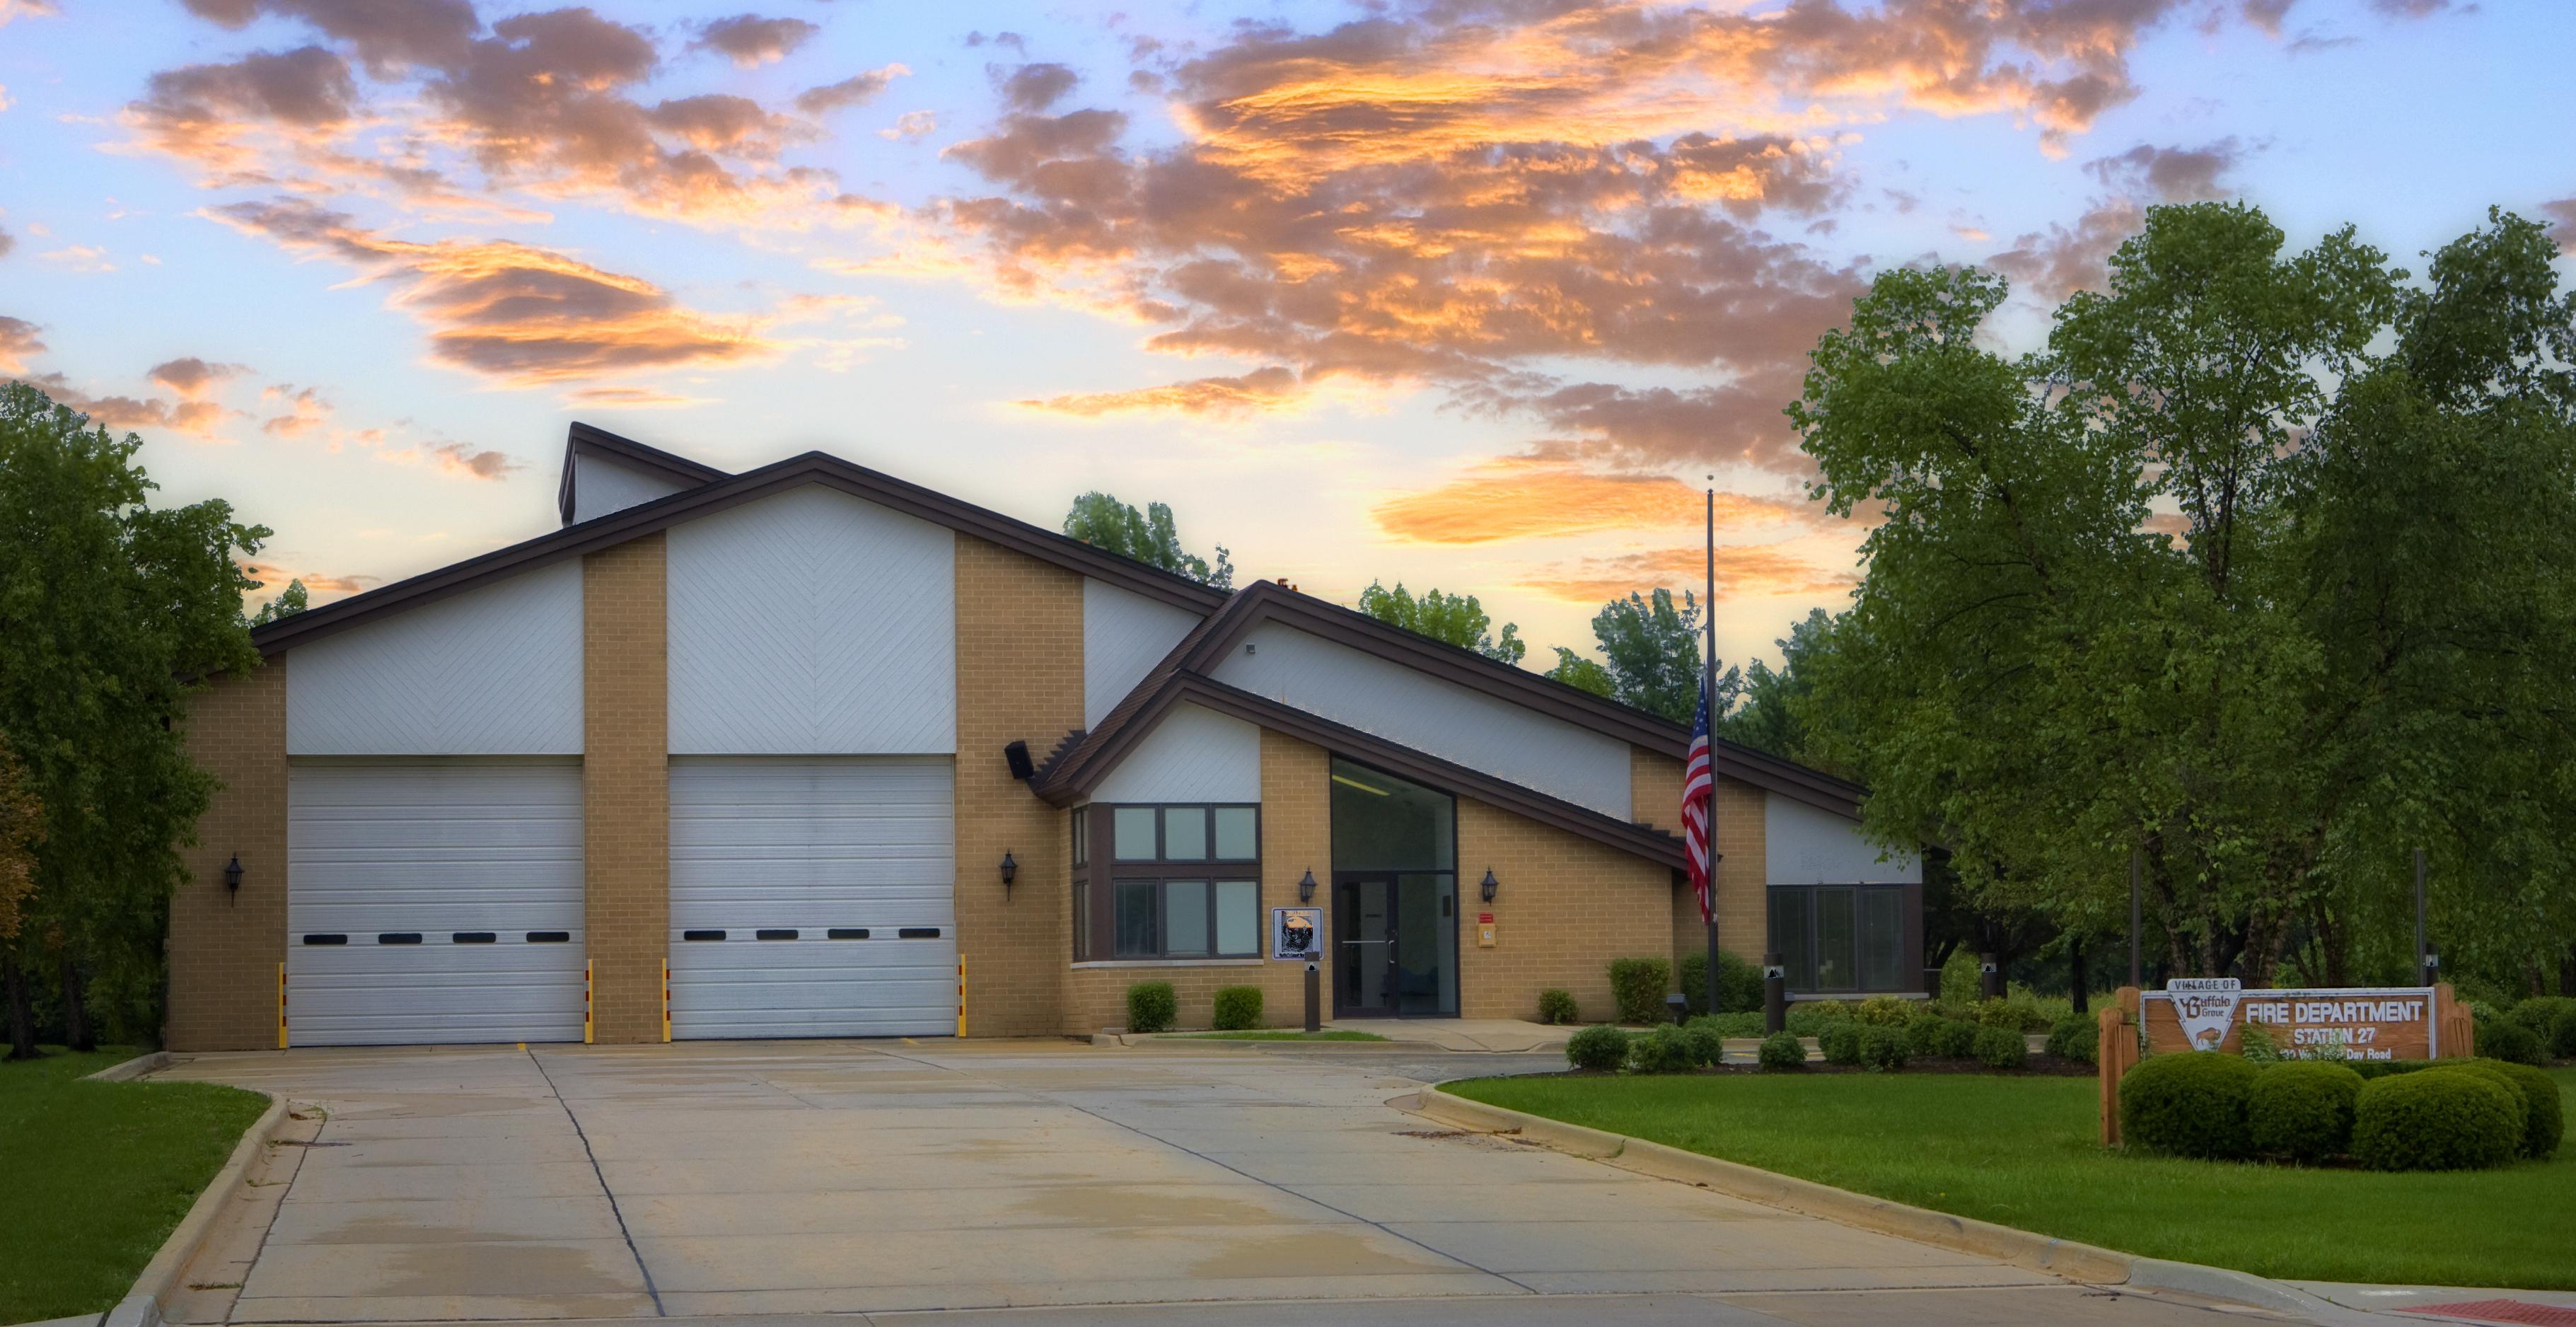 Buffalo Grove Fire Department Station 27